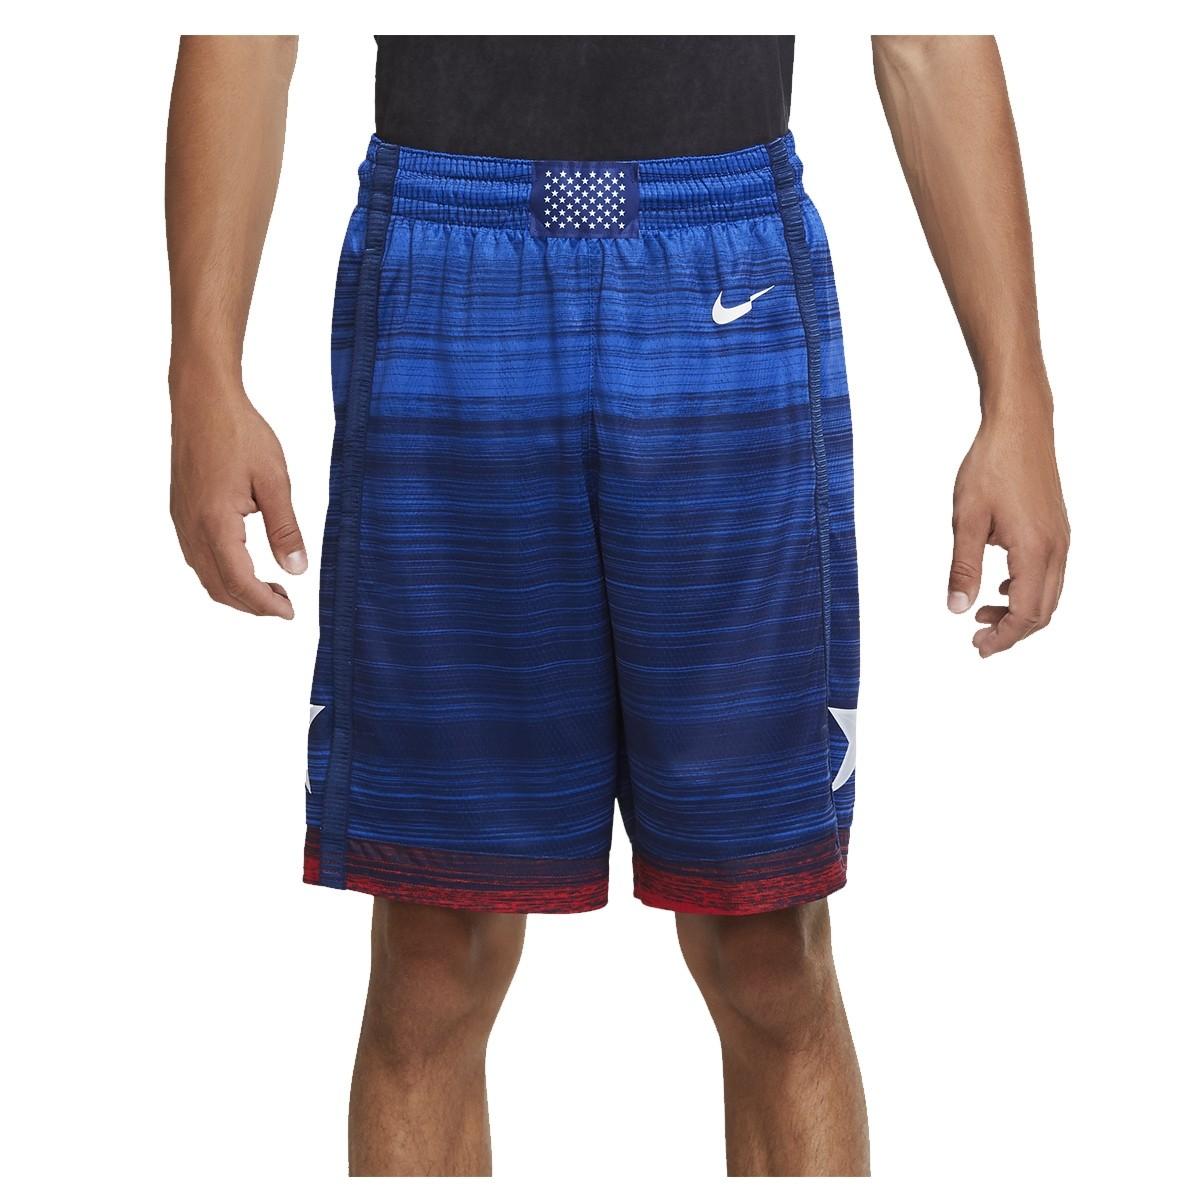 Pantalón Nike USA Olympics Tokyo 2020